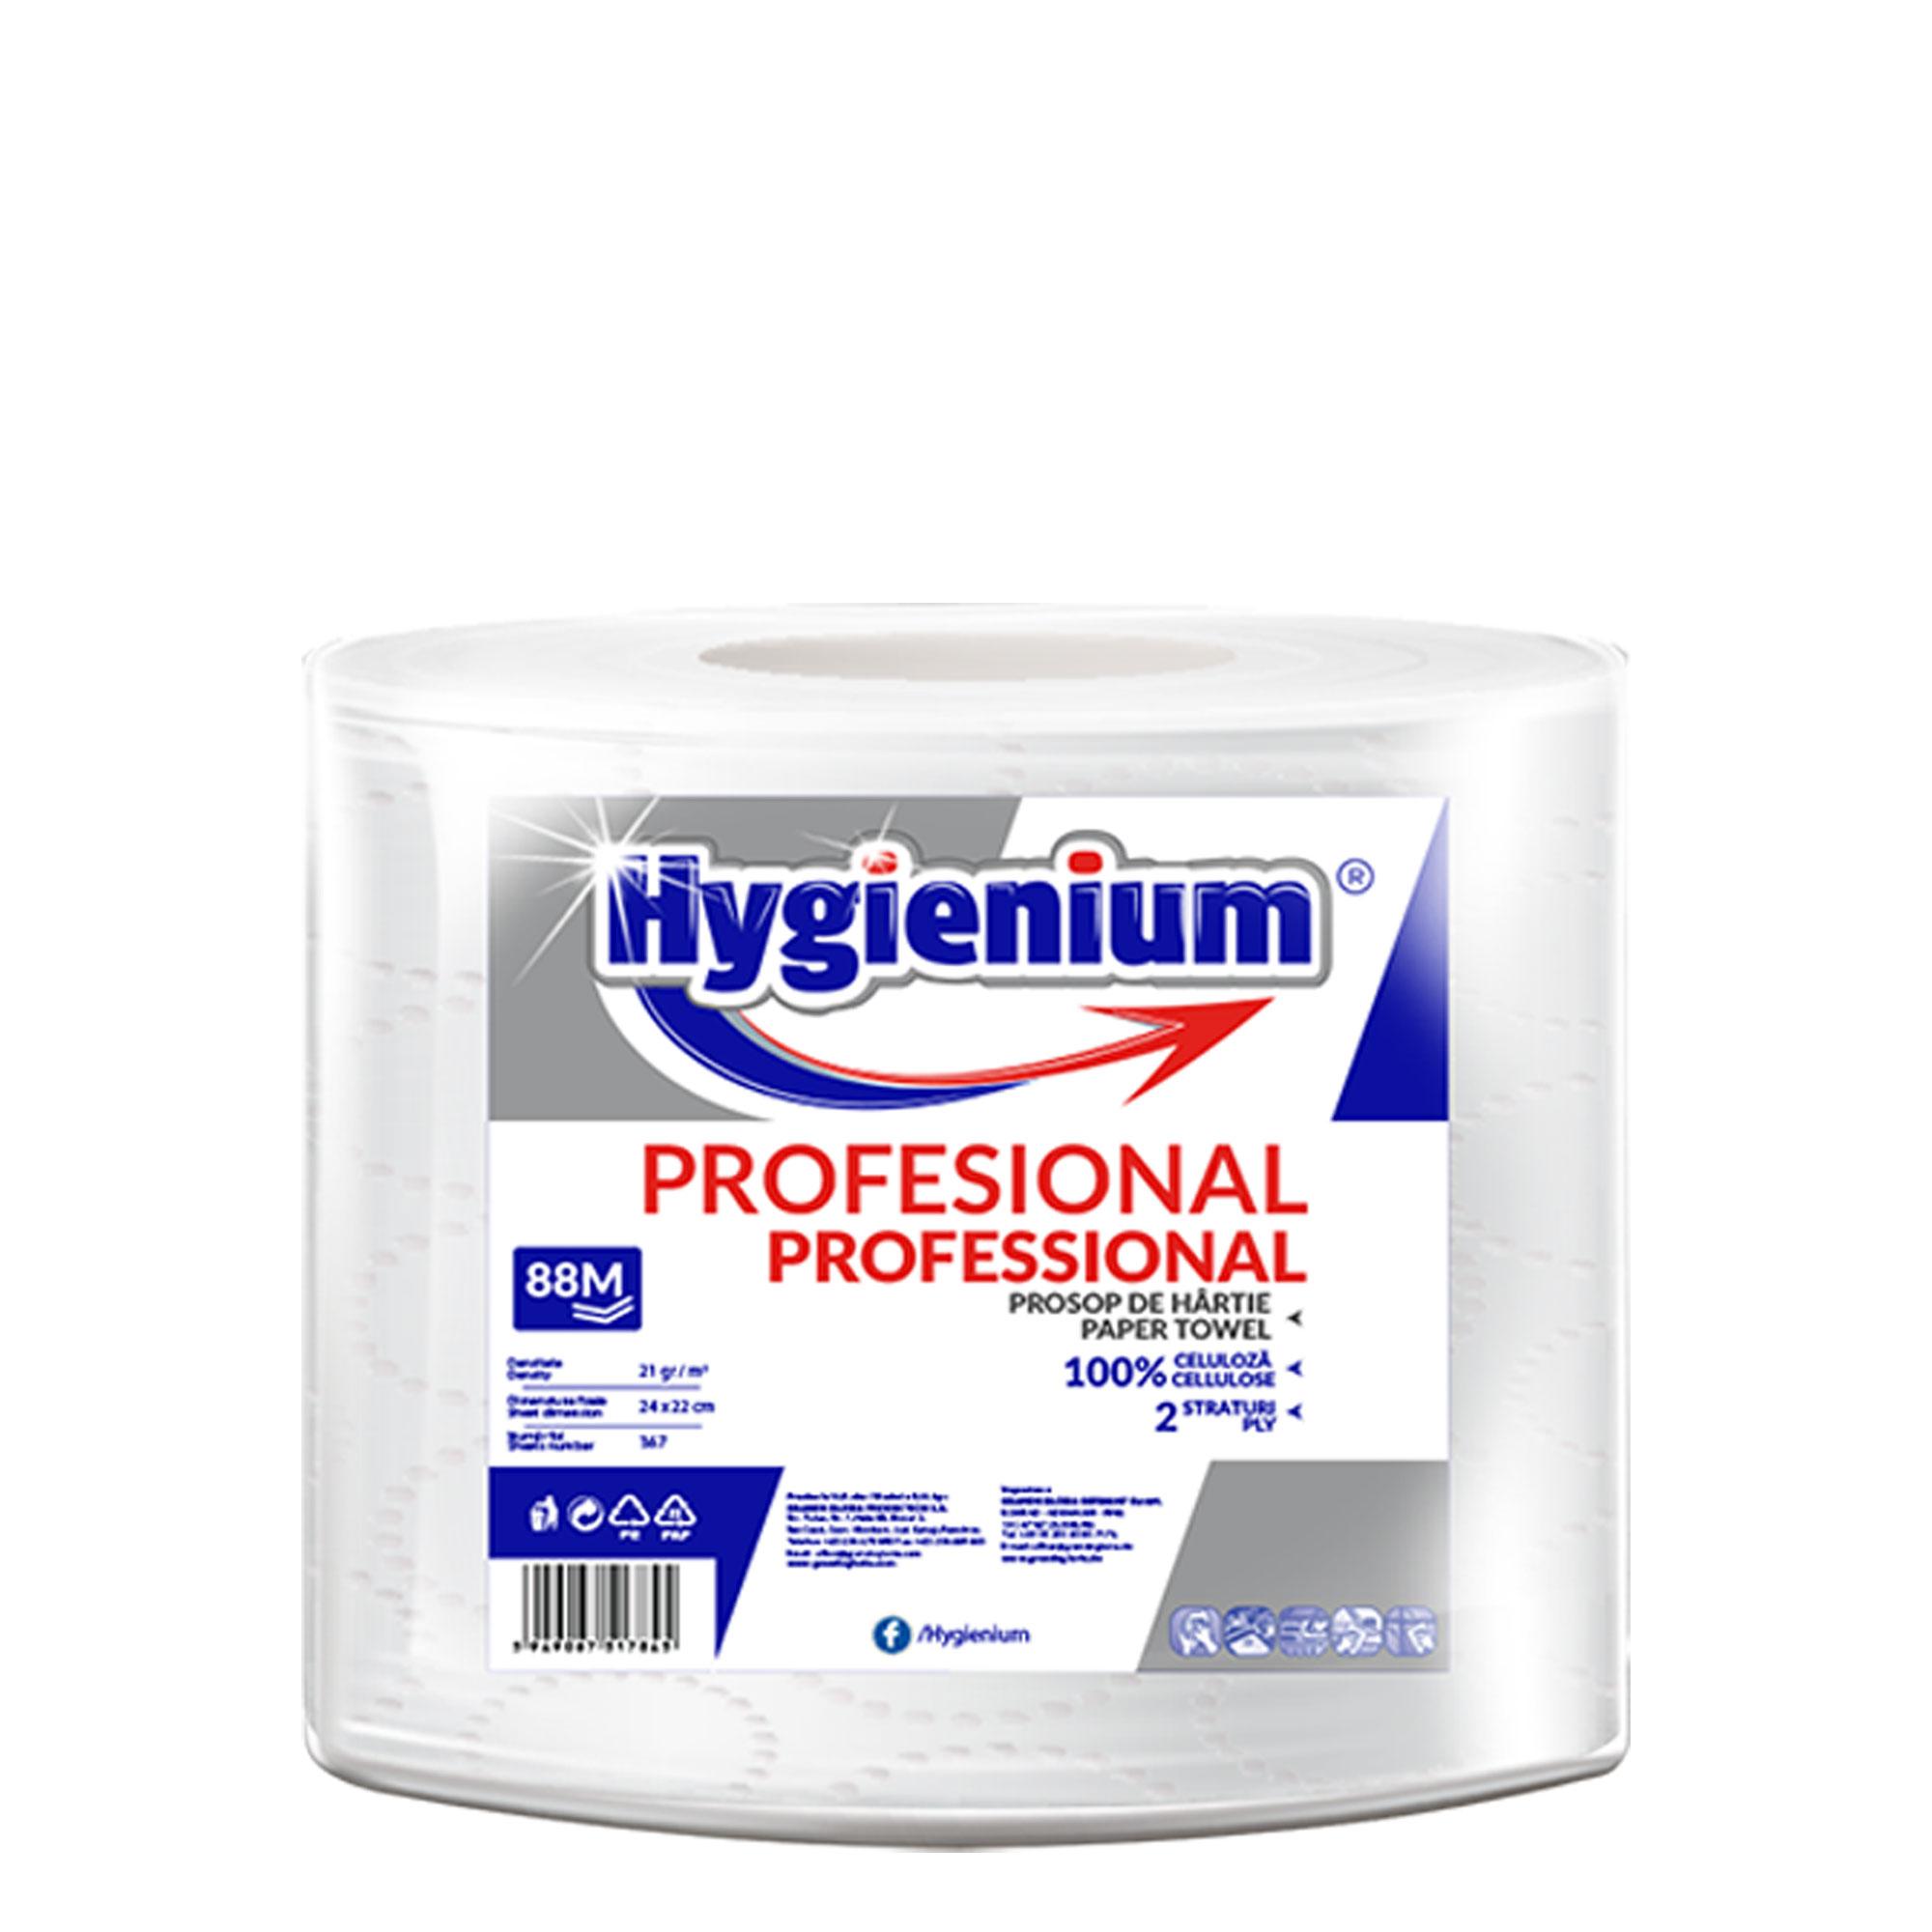 Hygienium Professional Paper Towel 88 M